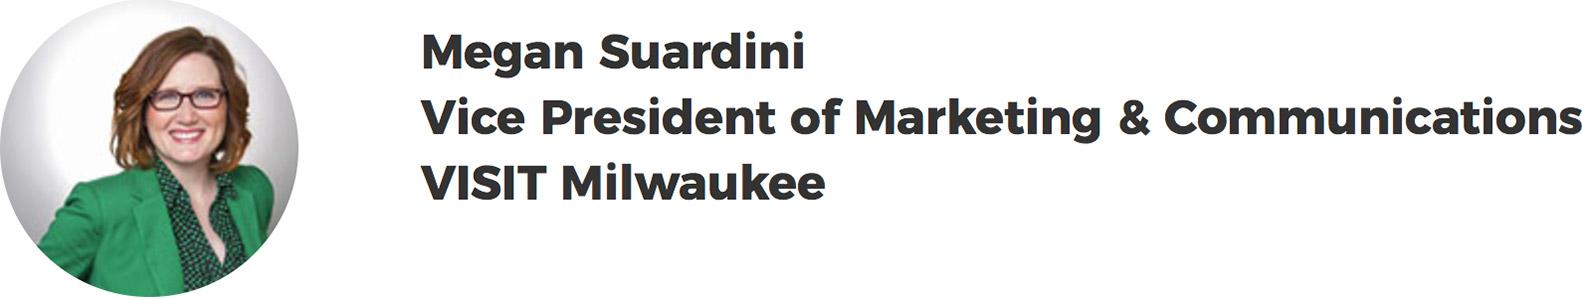 Megan Suardini - Vice President of Marketing & Communications – VISIT Milwaukee